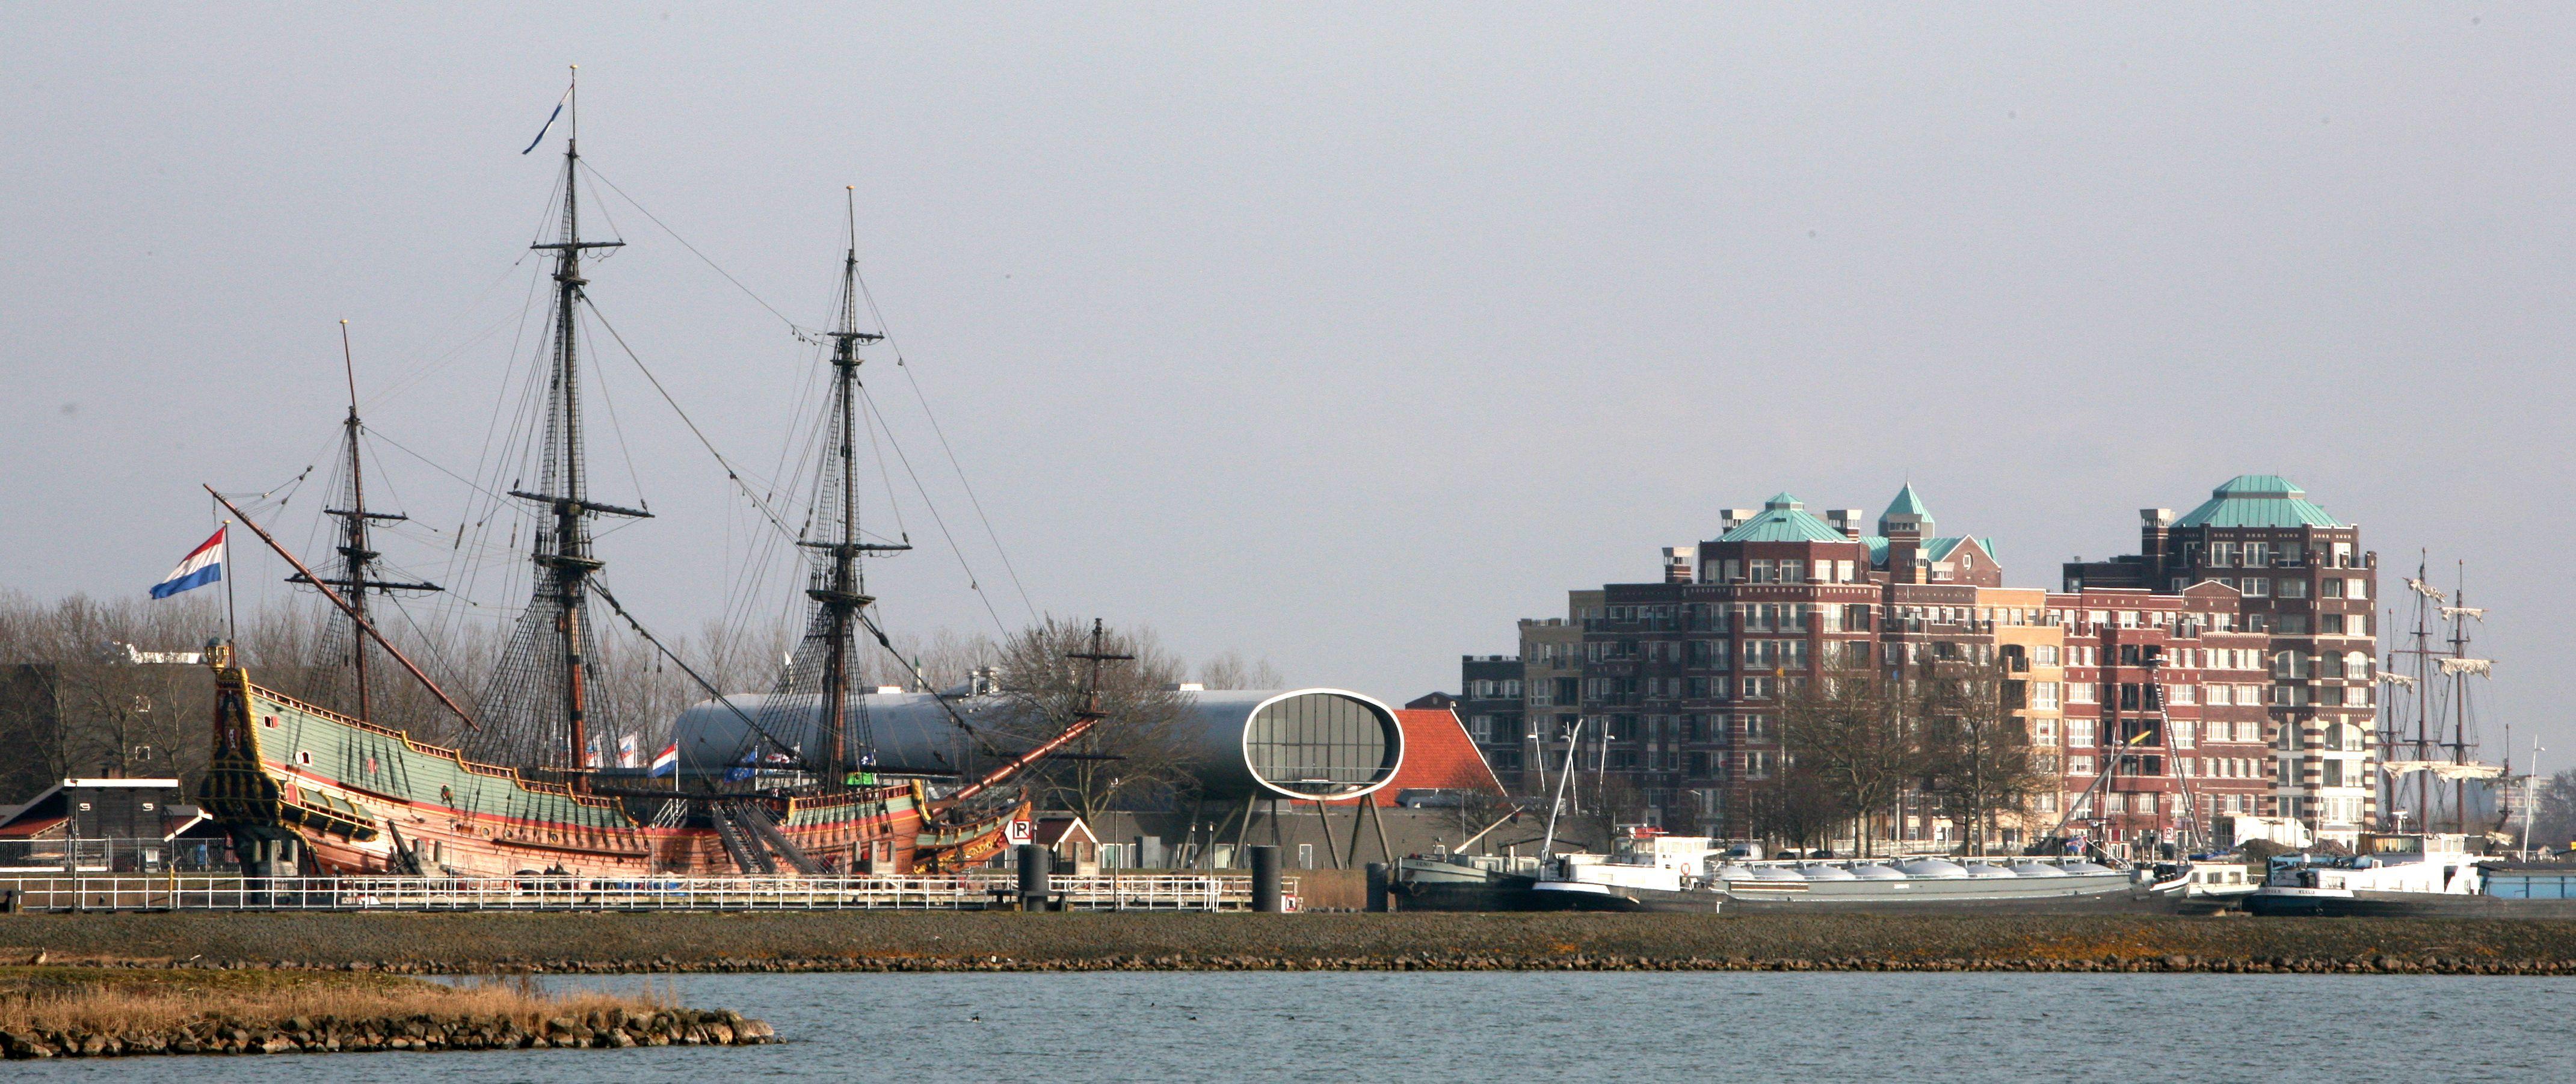 Skyline Lelystad - foto gemeente Lelystad